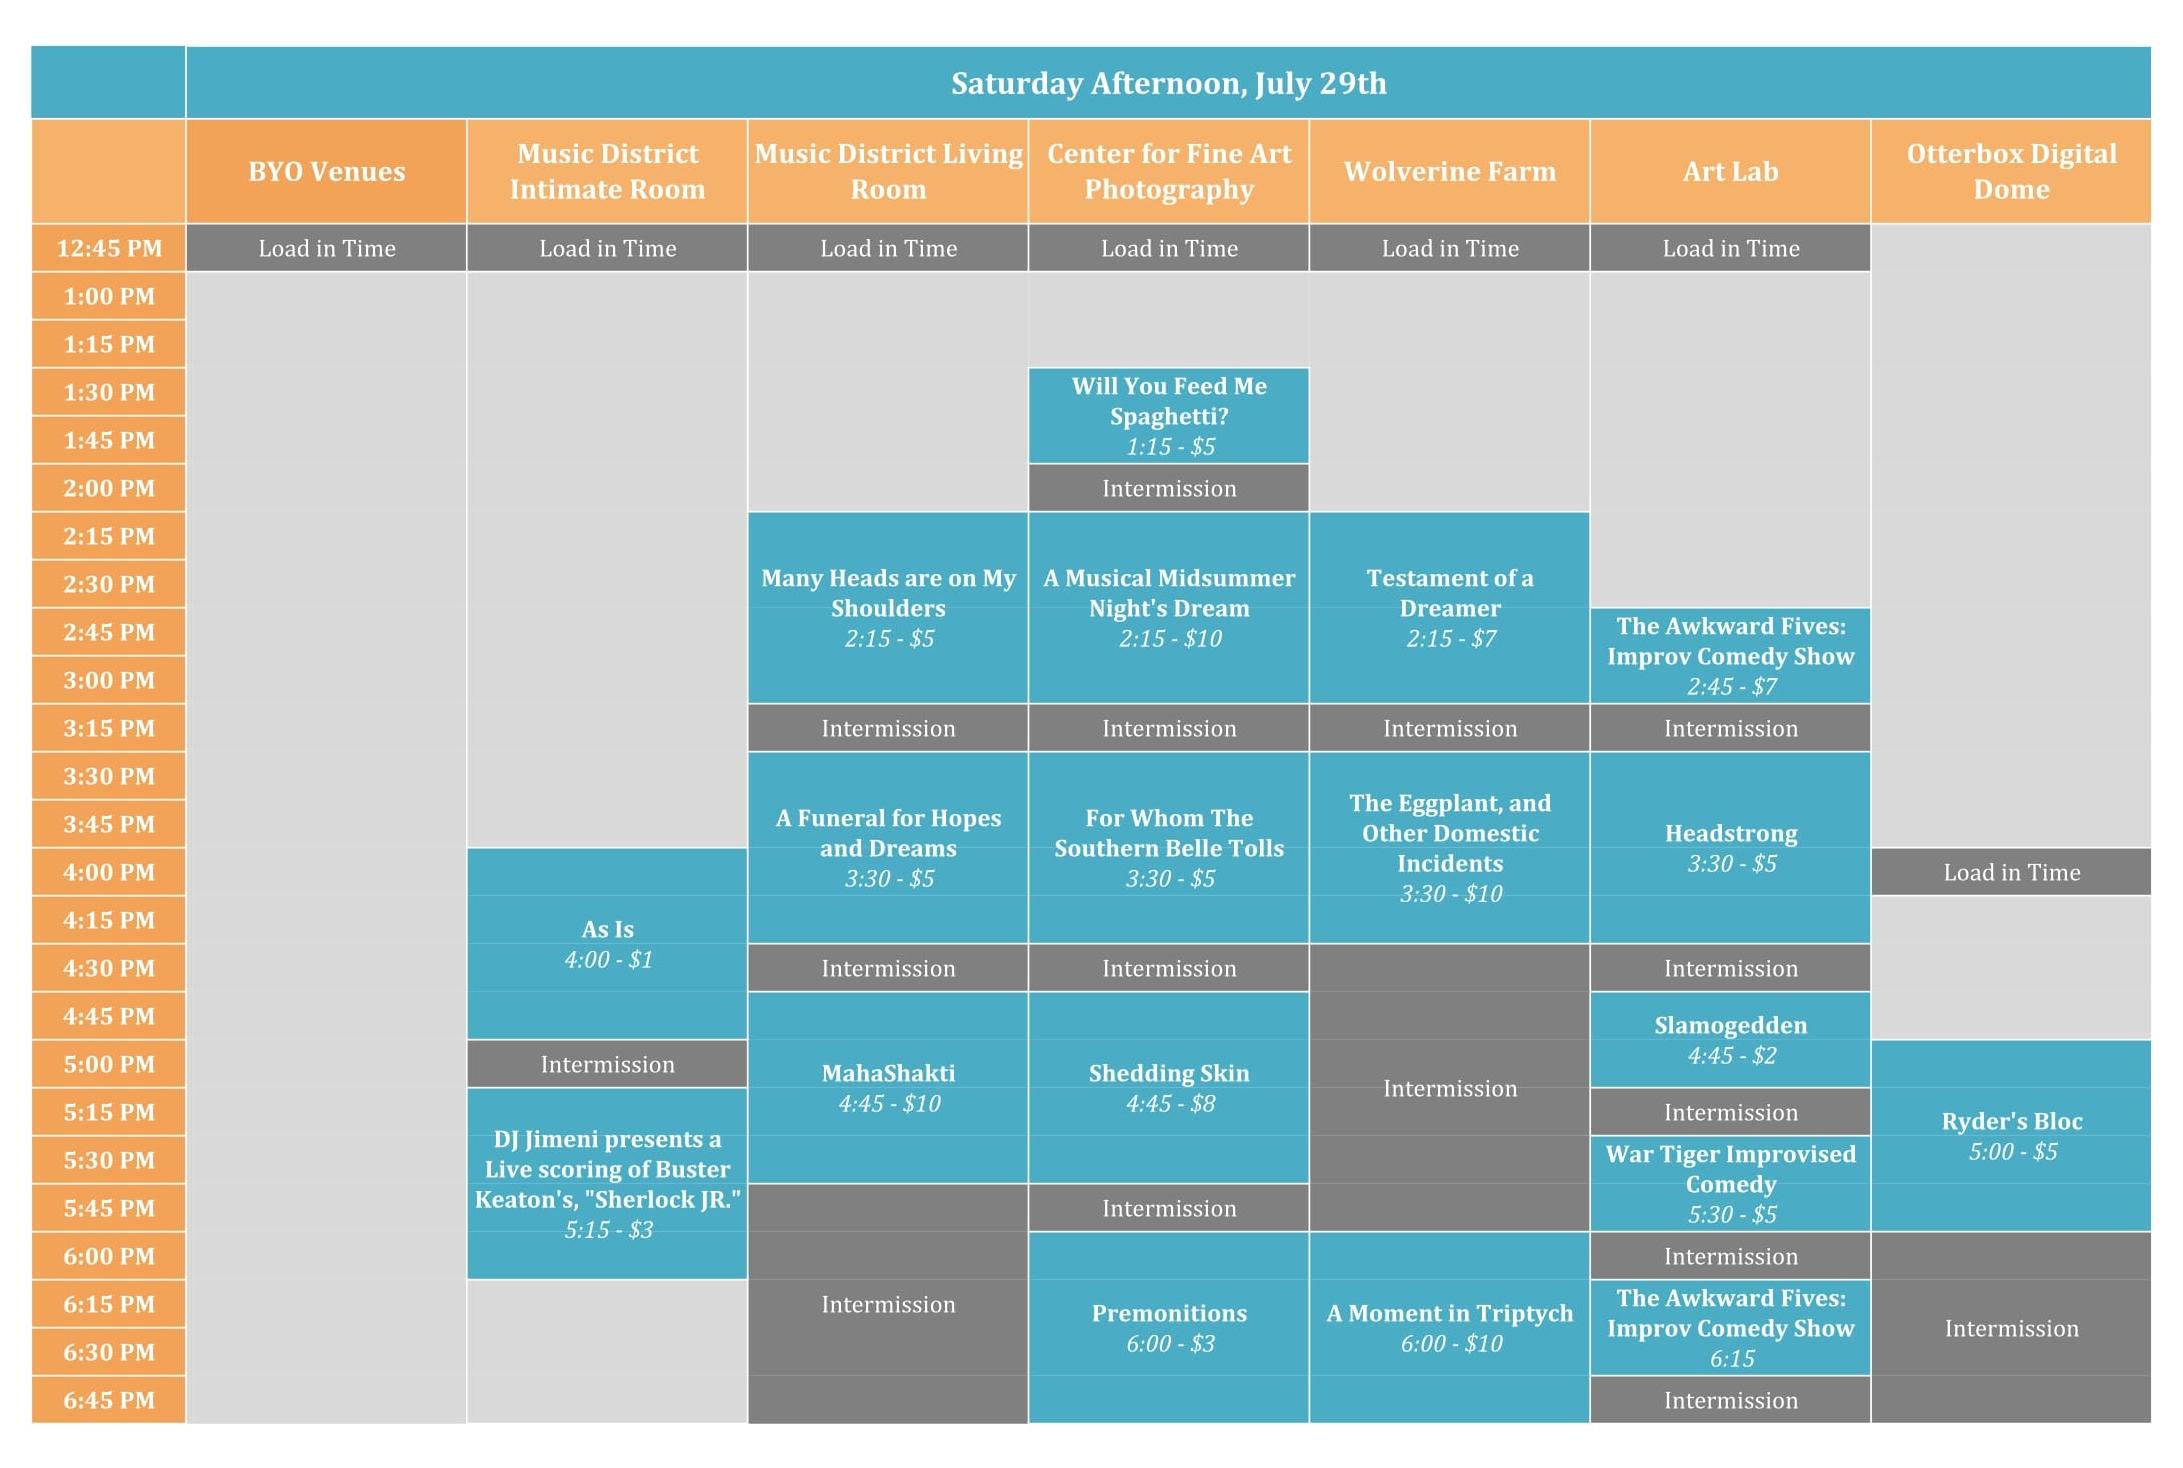 MASTER - FCFF 2017 Master Event Schedule 3 Saturday Afternoon-1.jpg